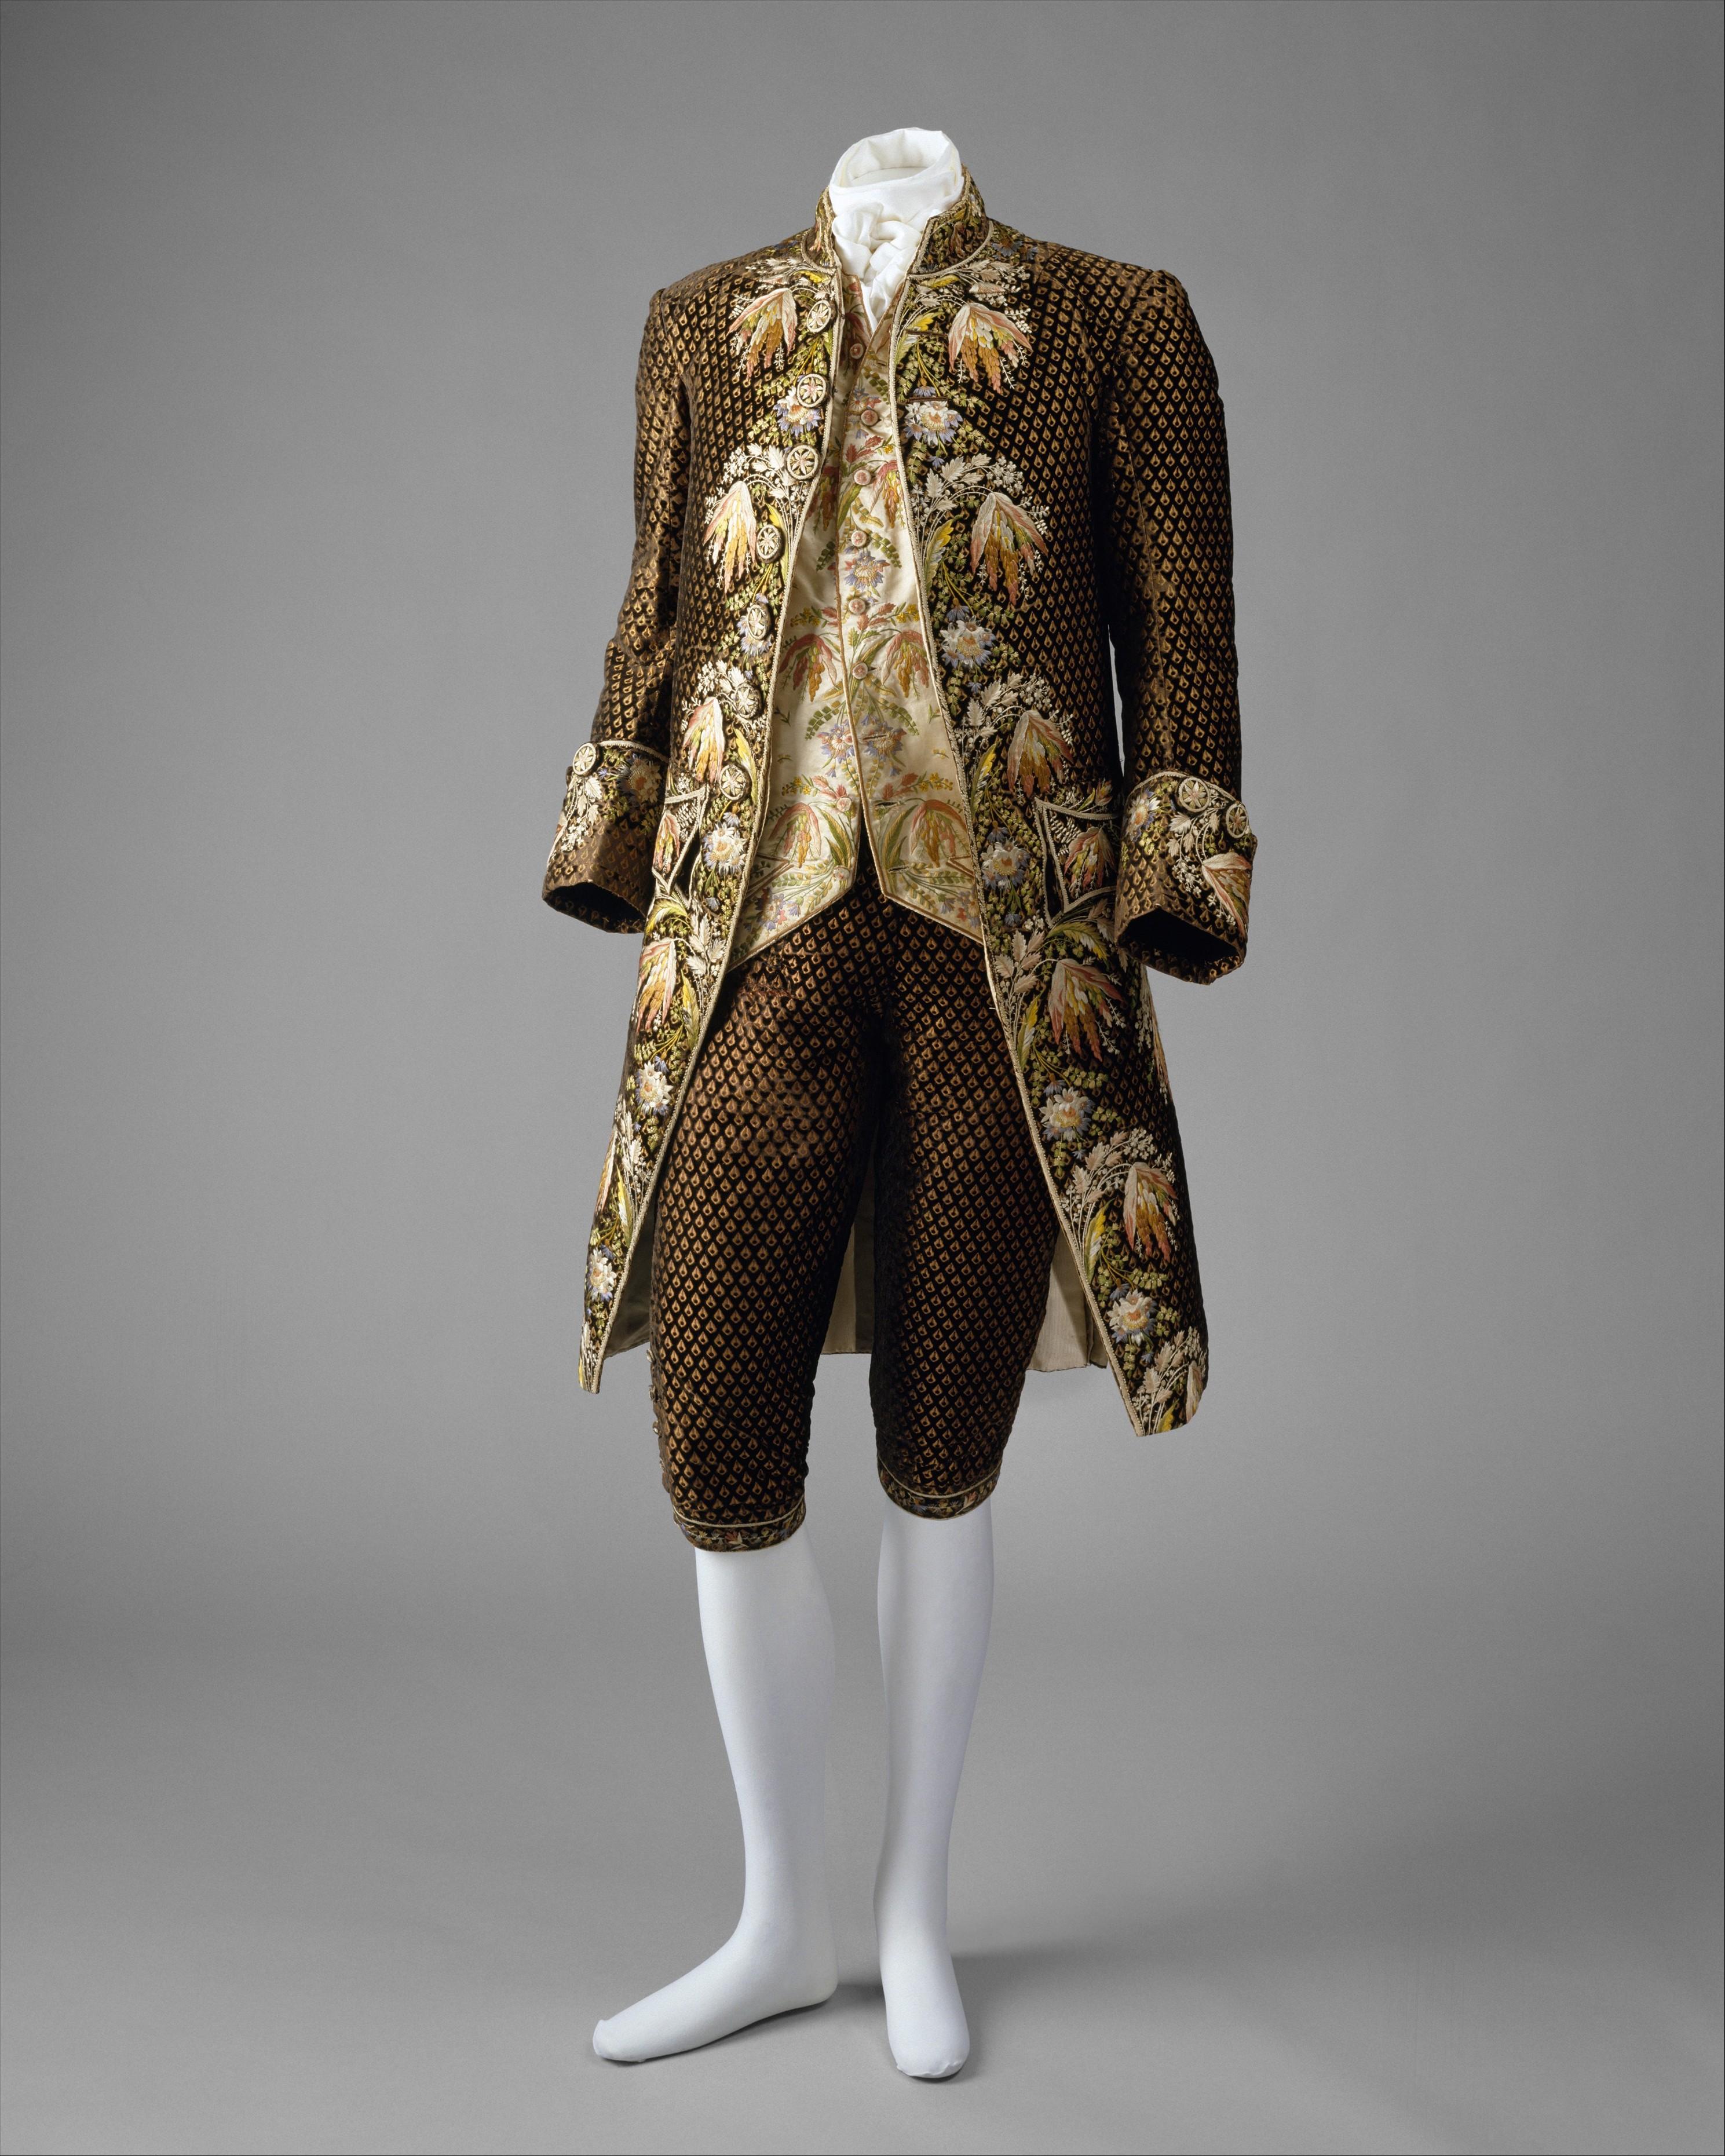 18th century clothing lovinglifeandbeingabitch for French rococo fashion